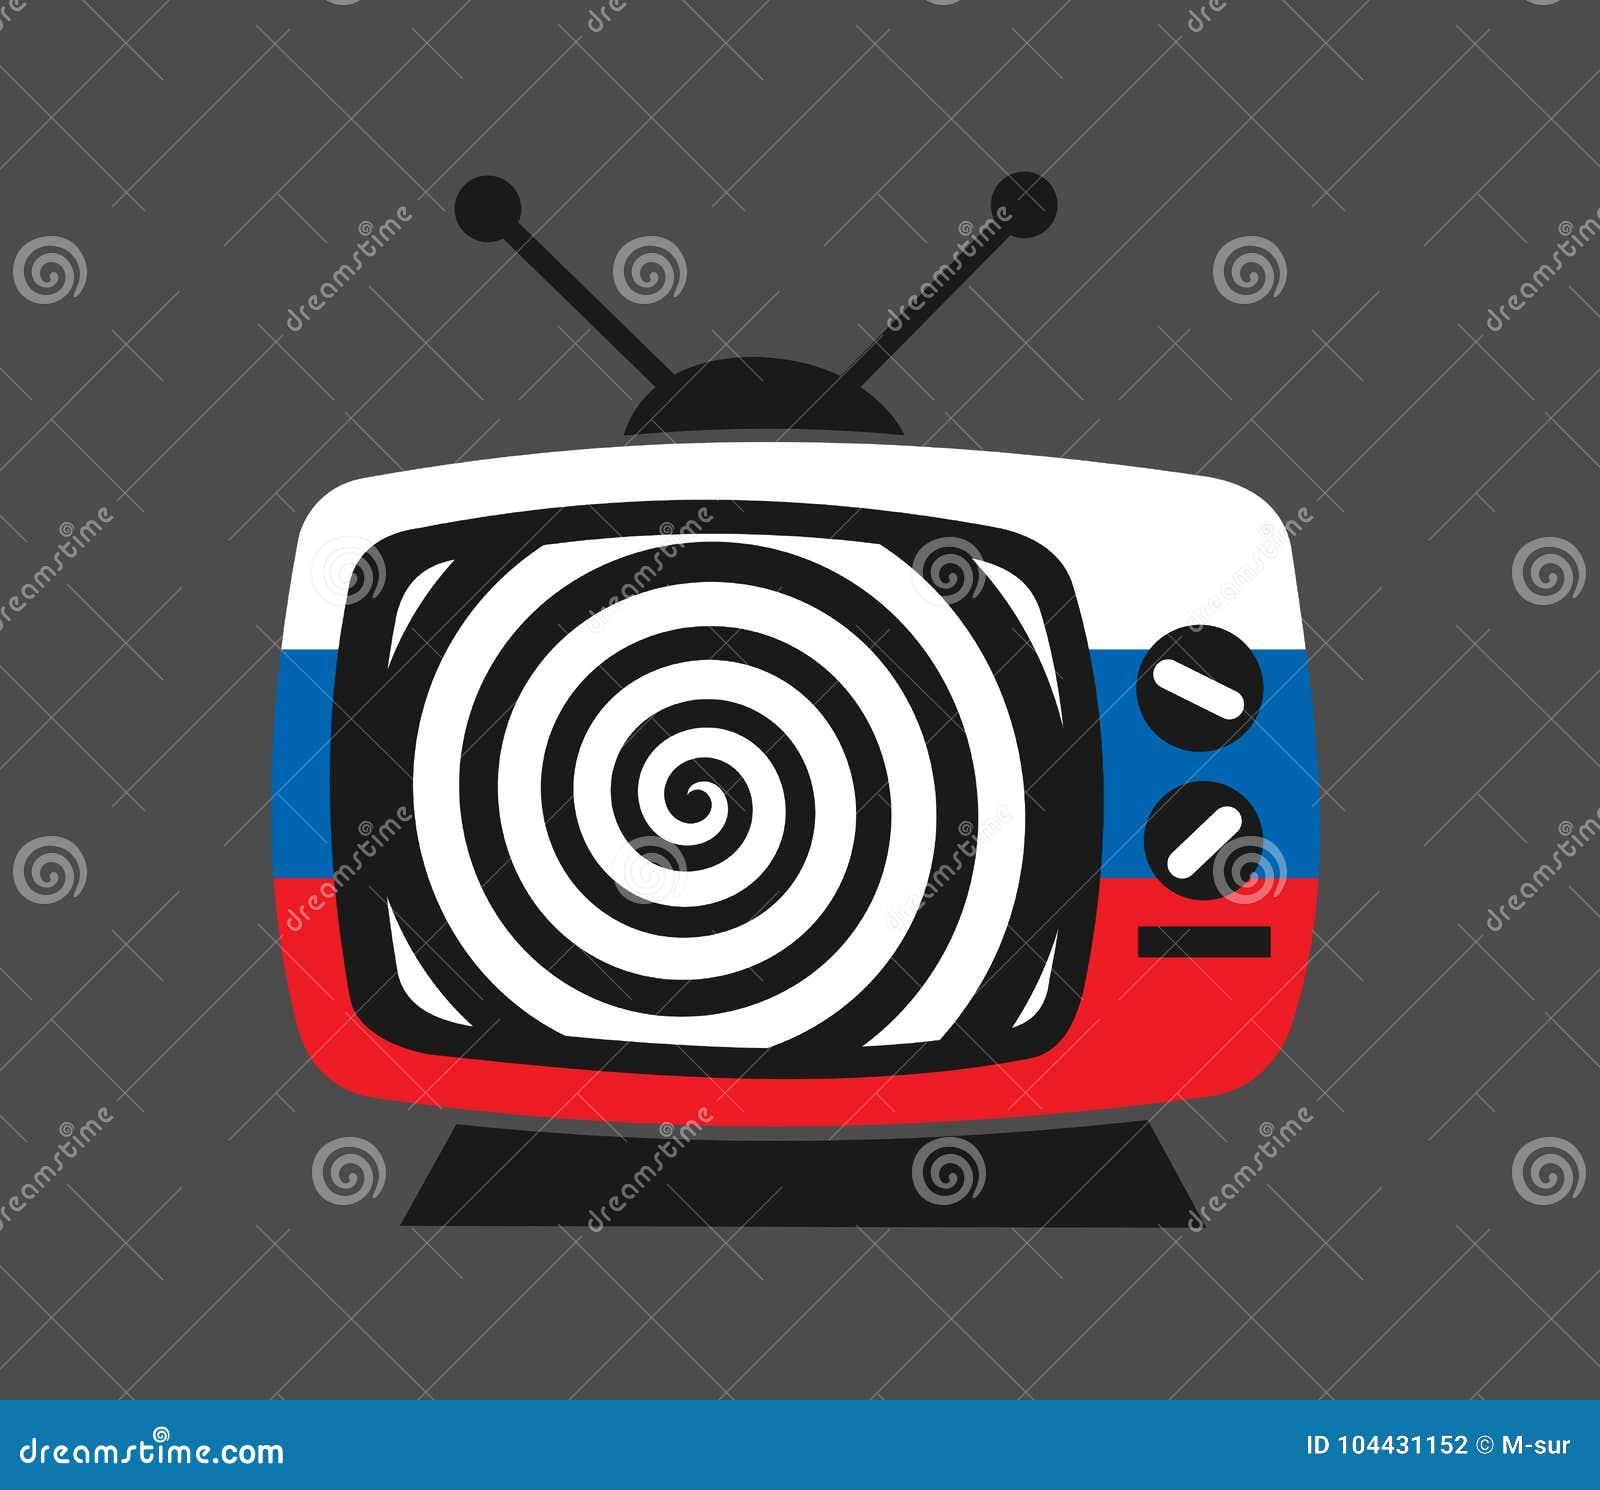 Russian Manipulation, disinformation, fake news and propaganda